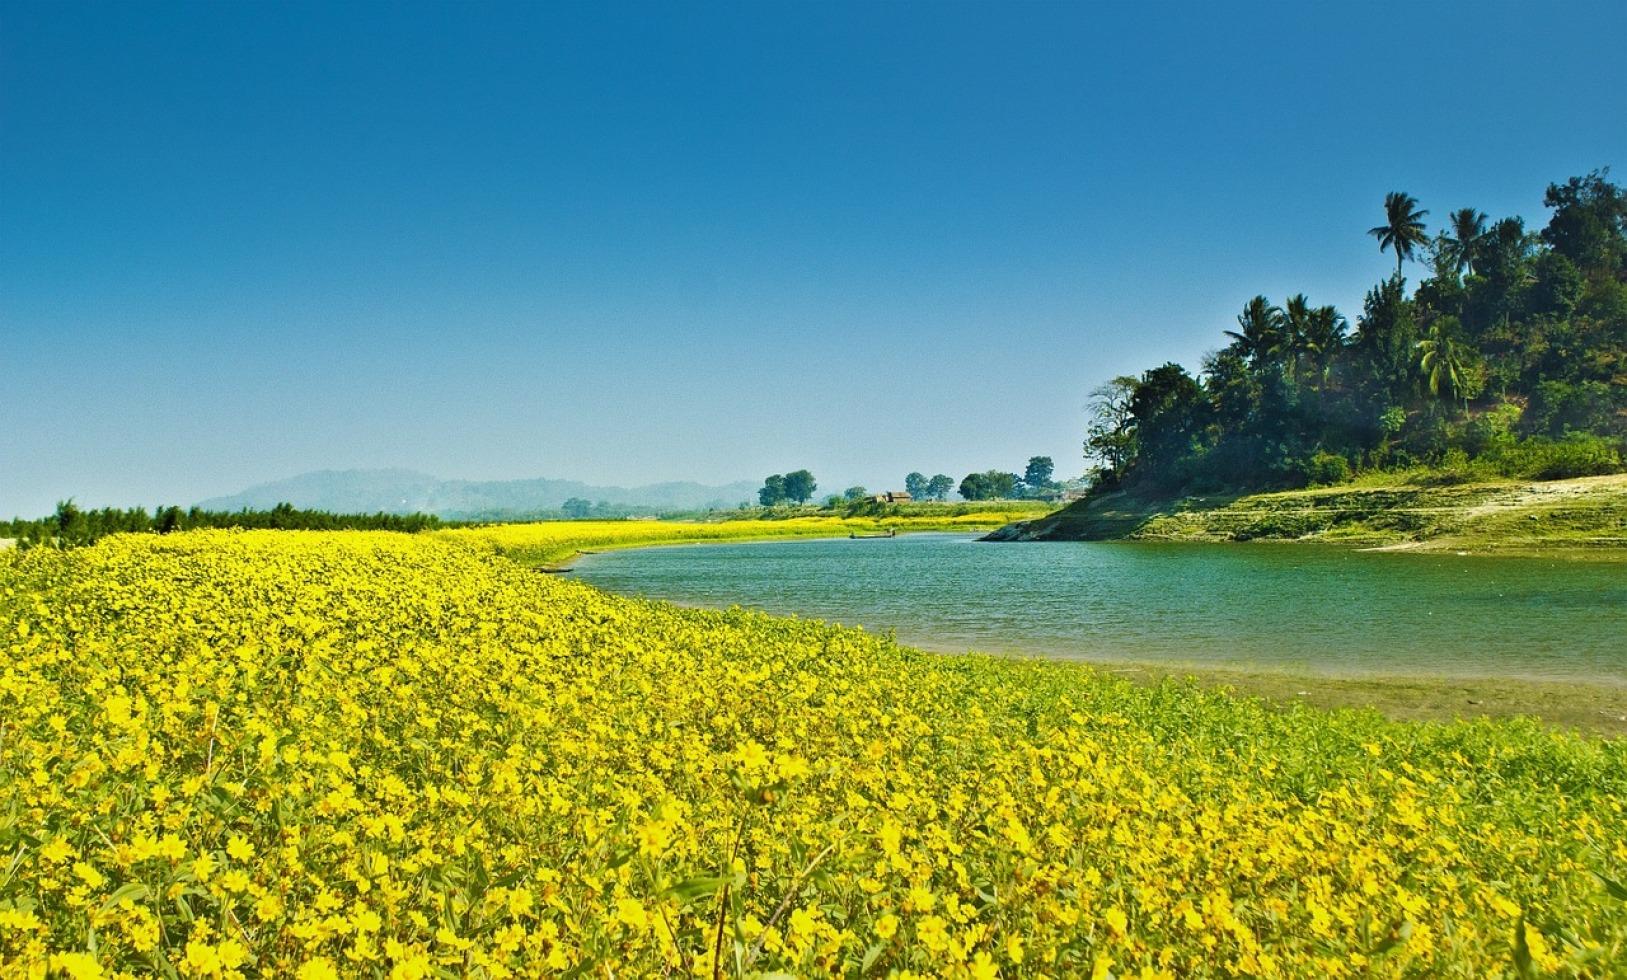 Lilabari, Assam